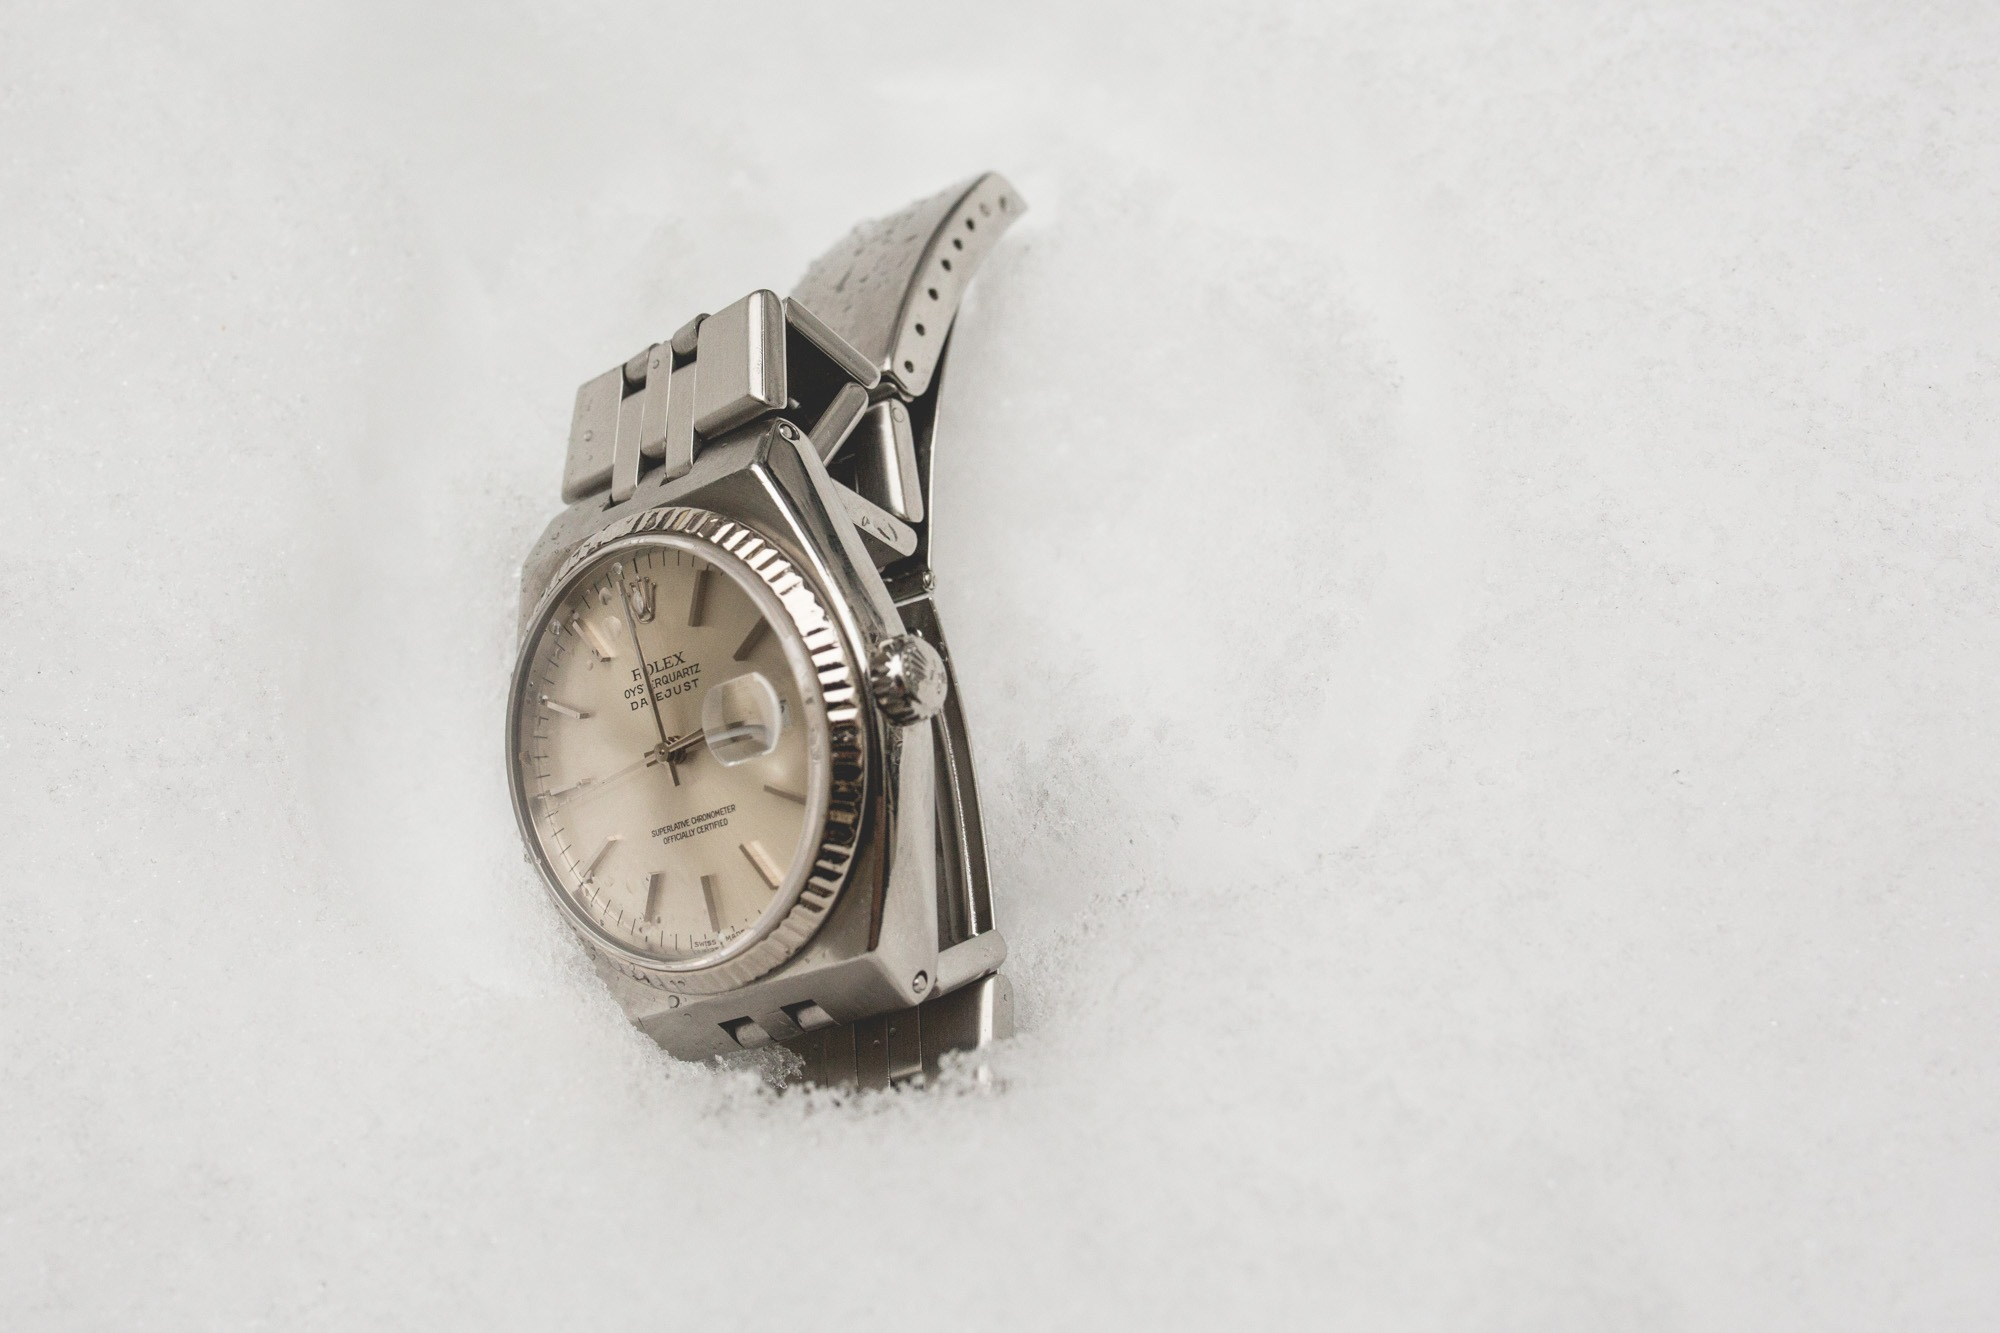 Rolex Oysterquartz - Datejust 17014 - tranche